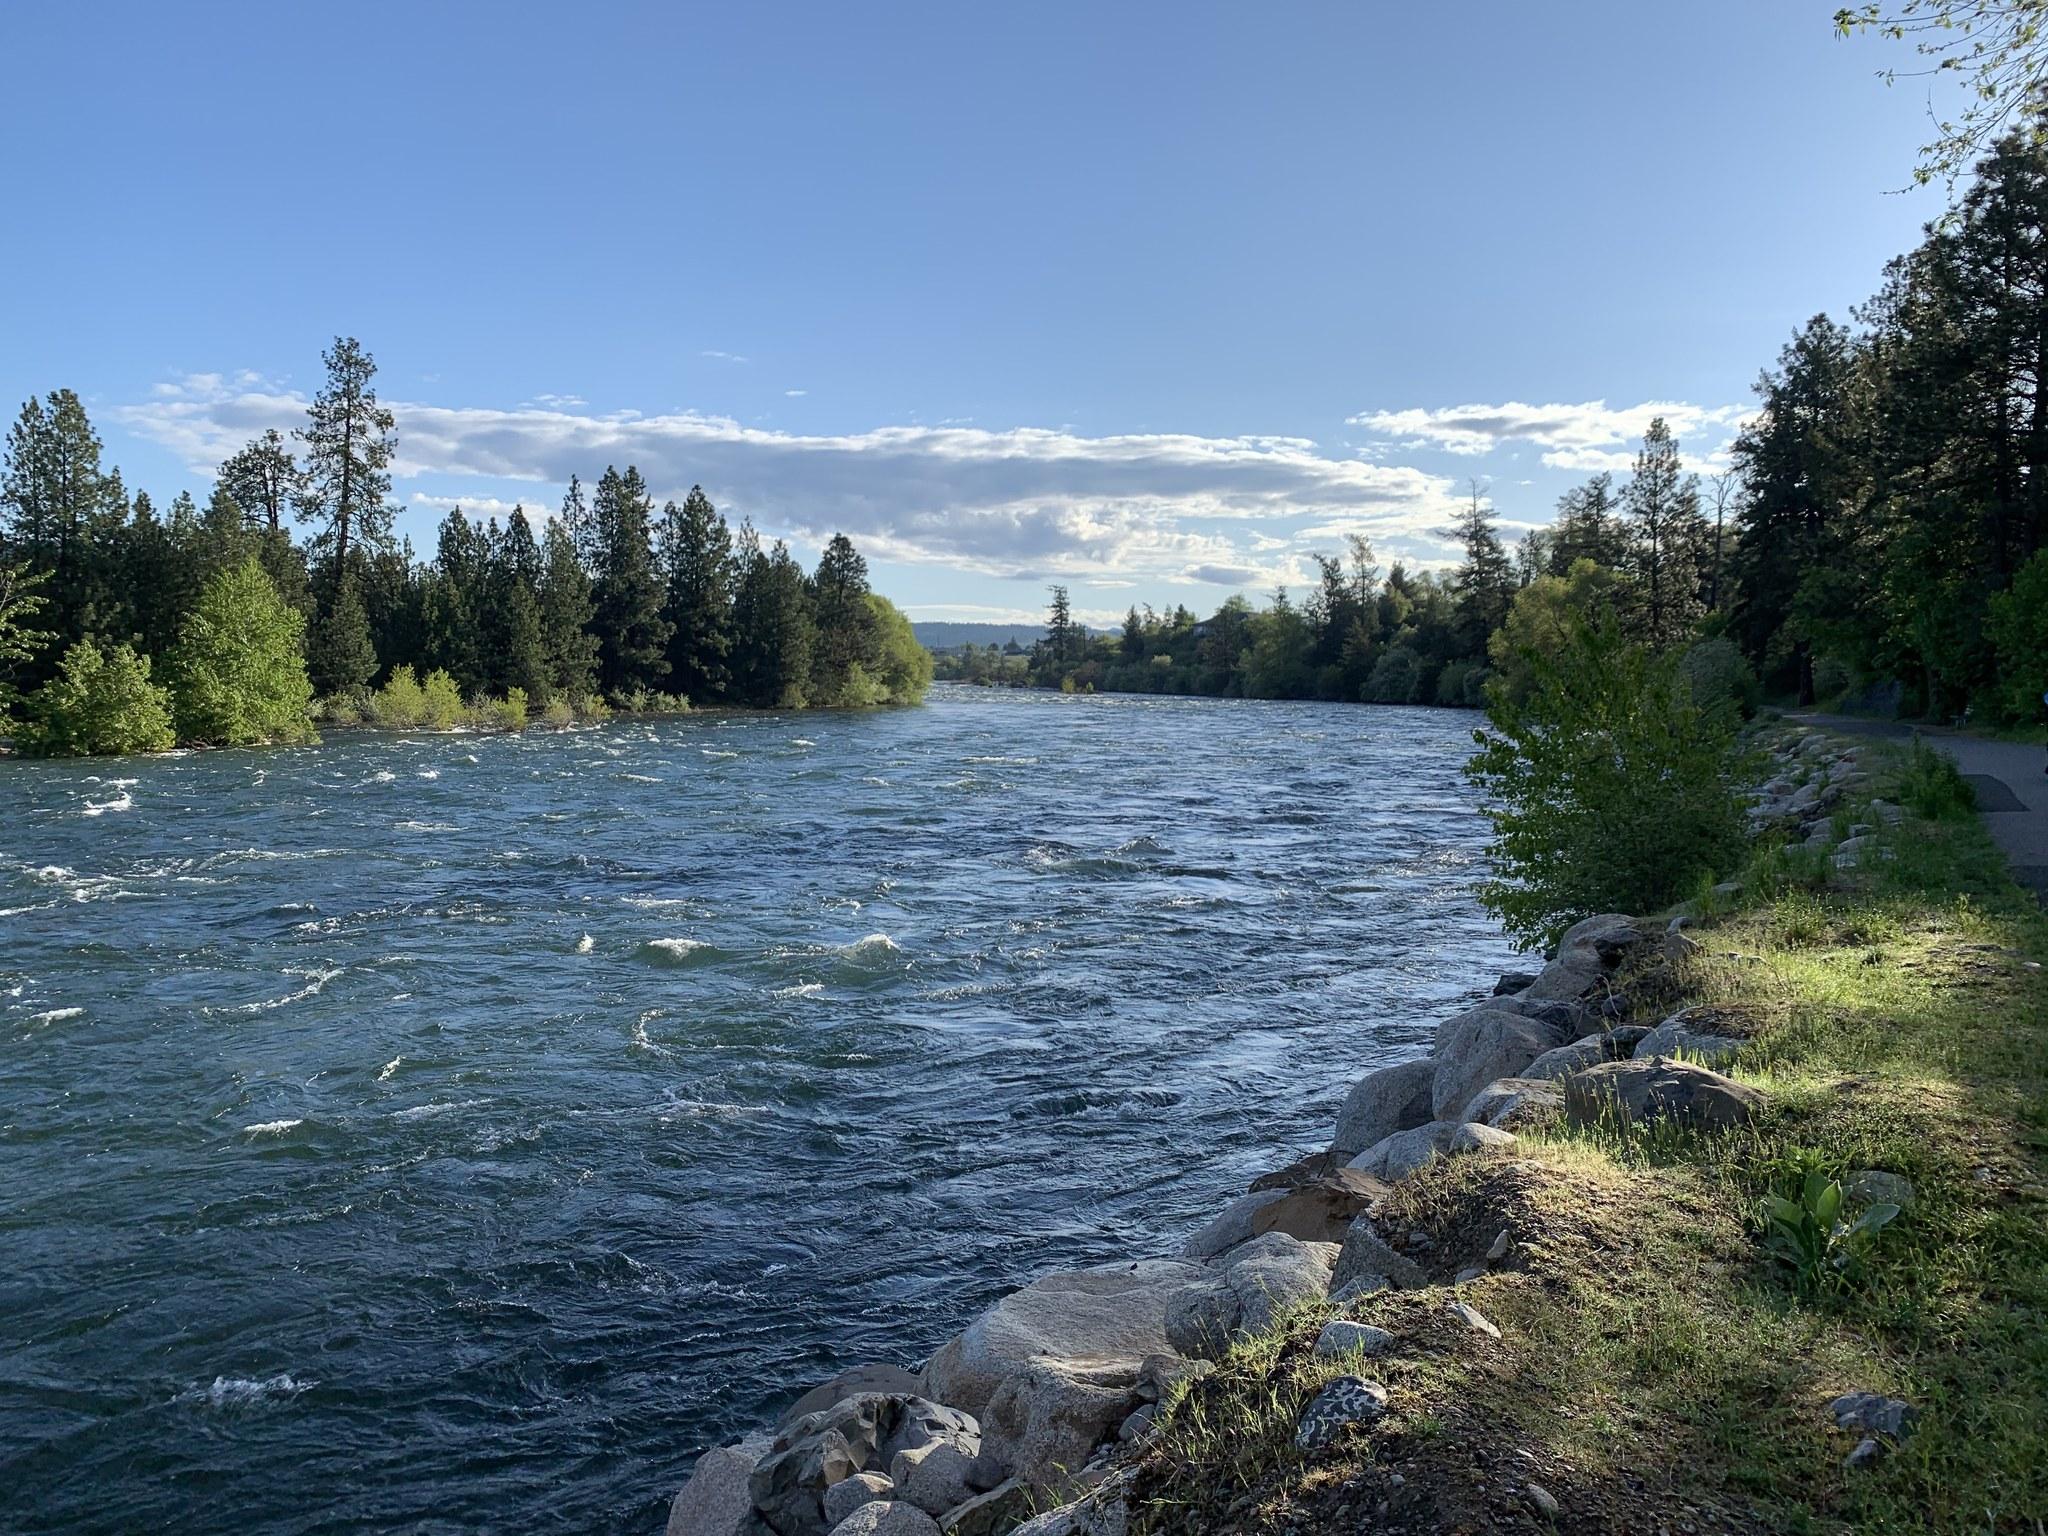 spokane river_california girl.jpeg